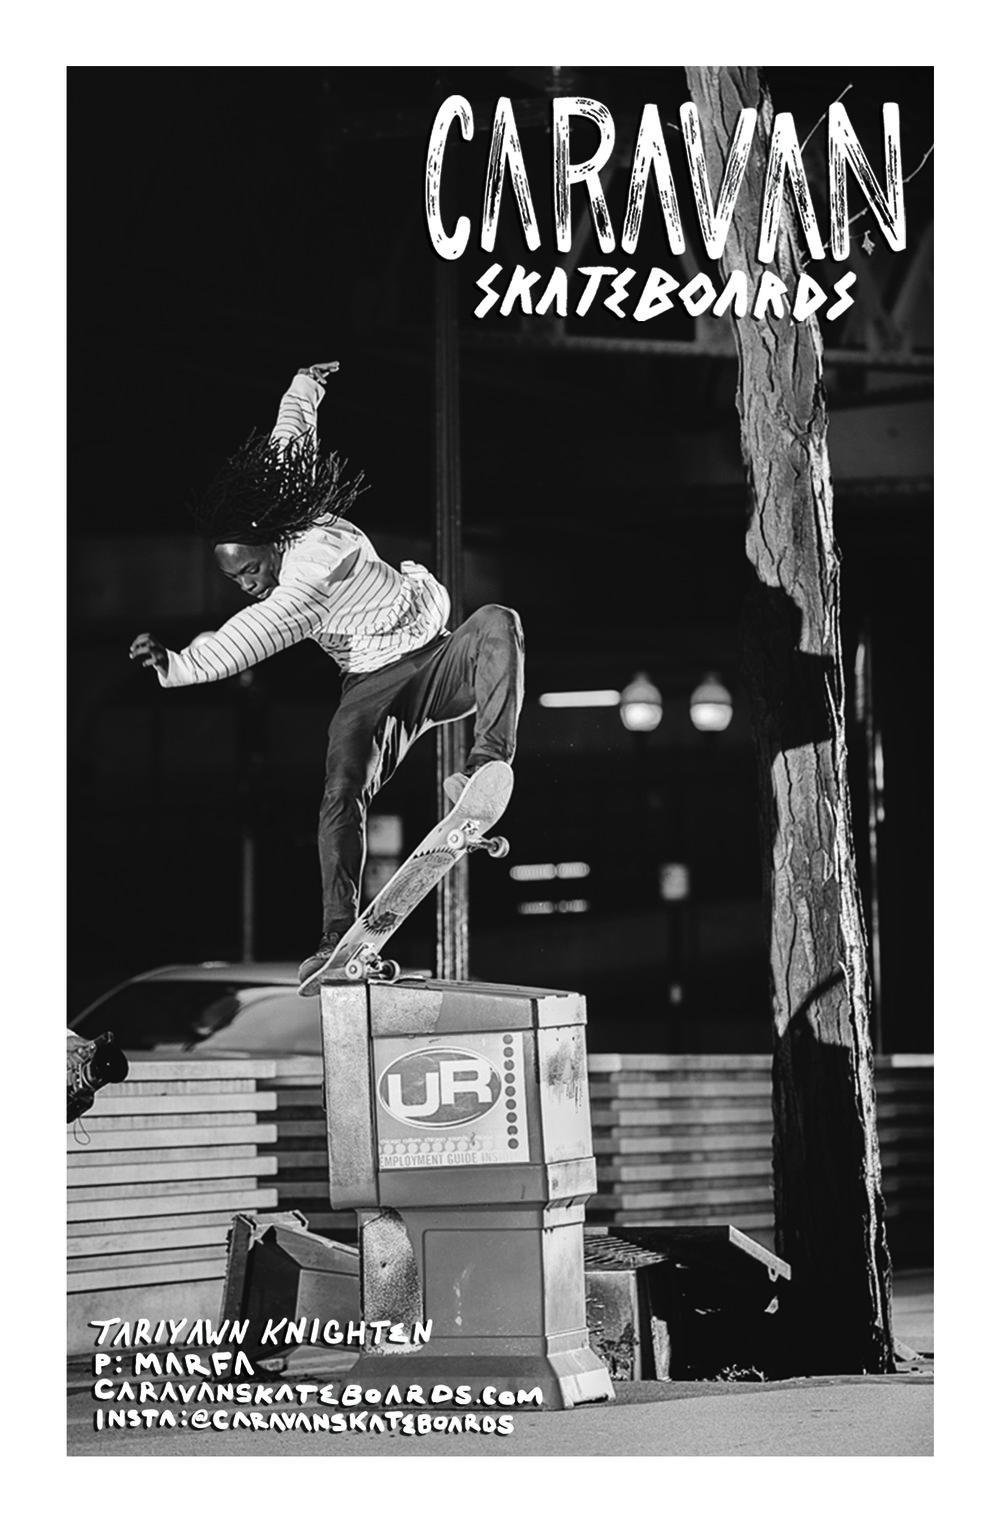 SkateJawnNov17_Caravan_BluntNewsBox_TariyawnMarfa.jpg